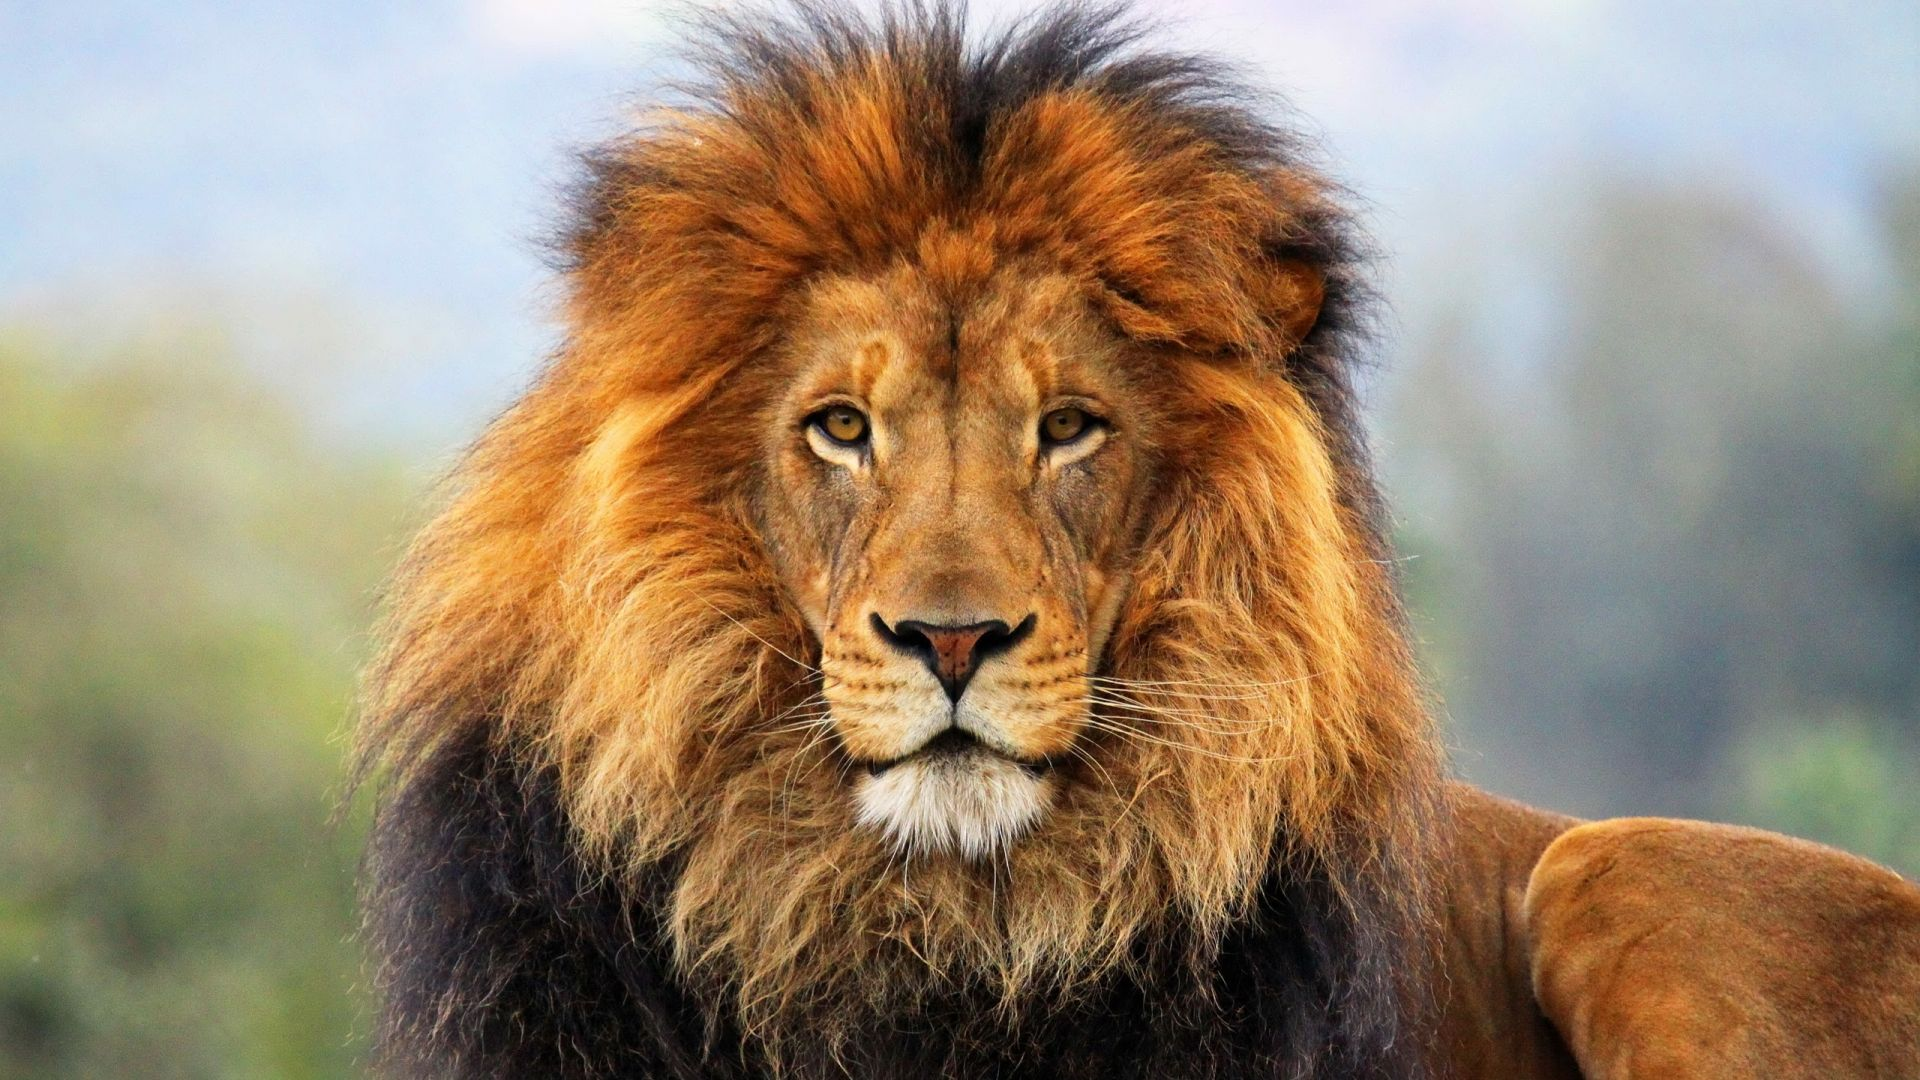 Wallpaper Calm Lion animal